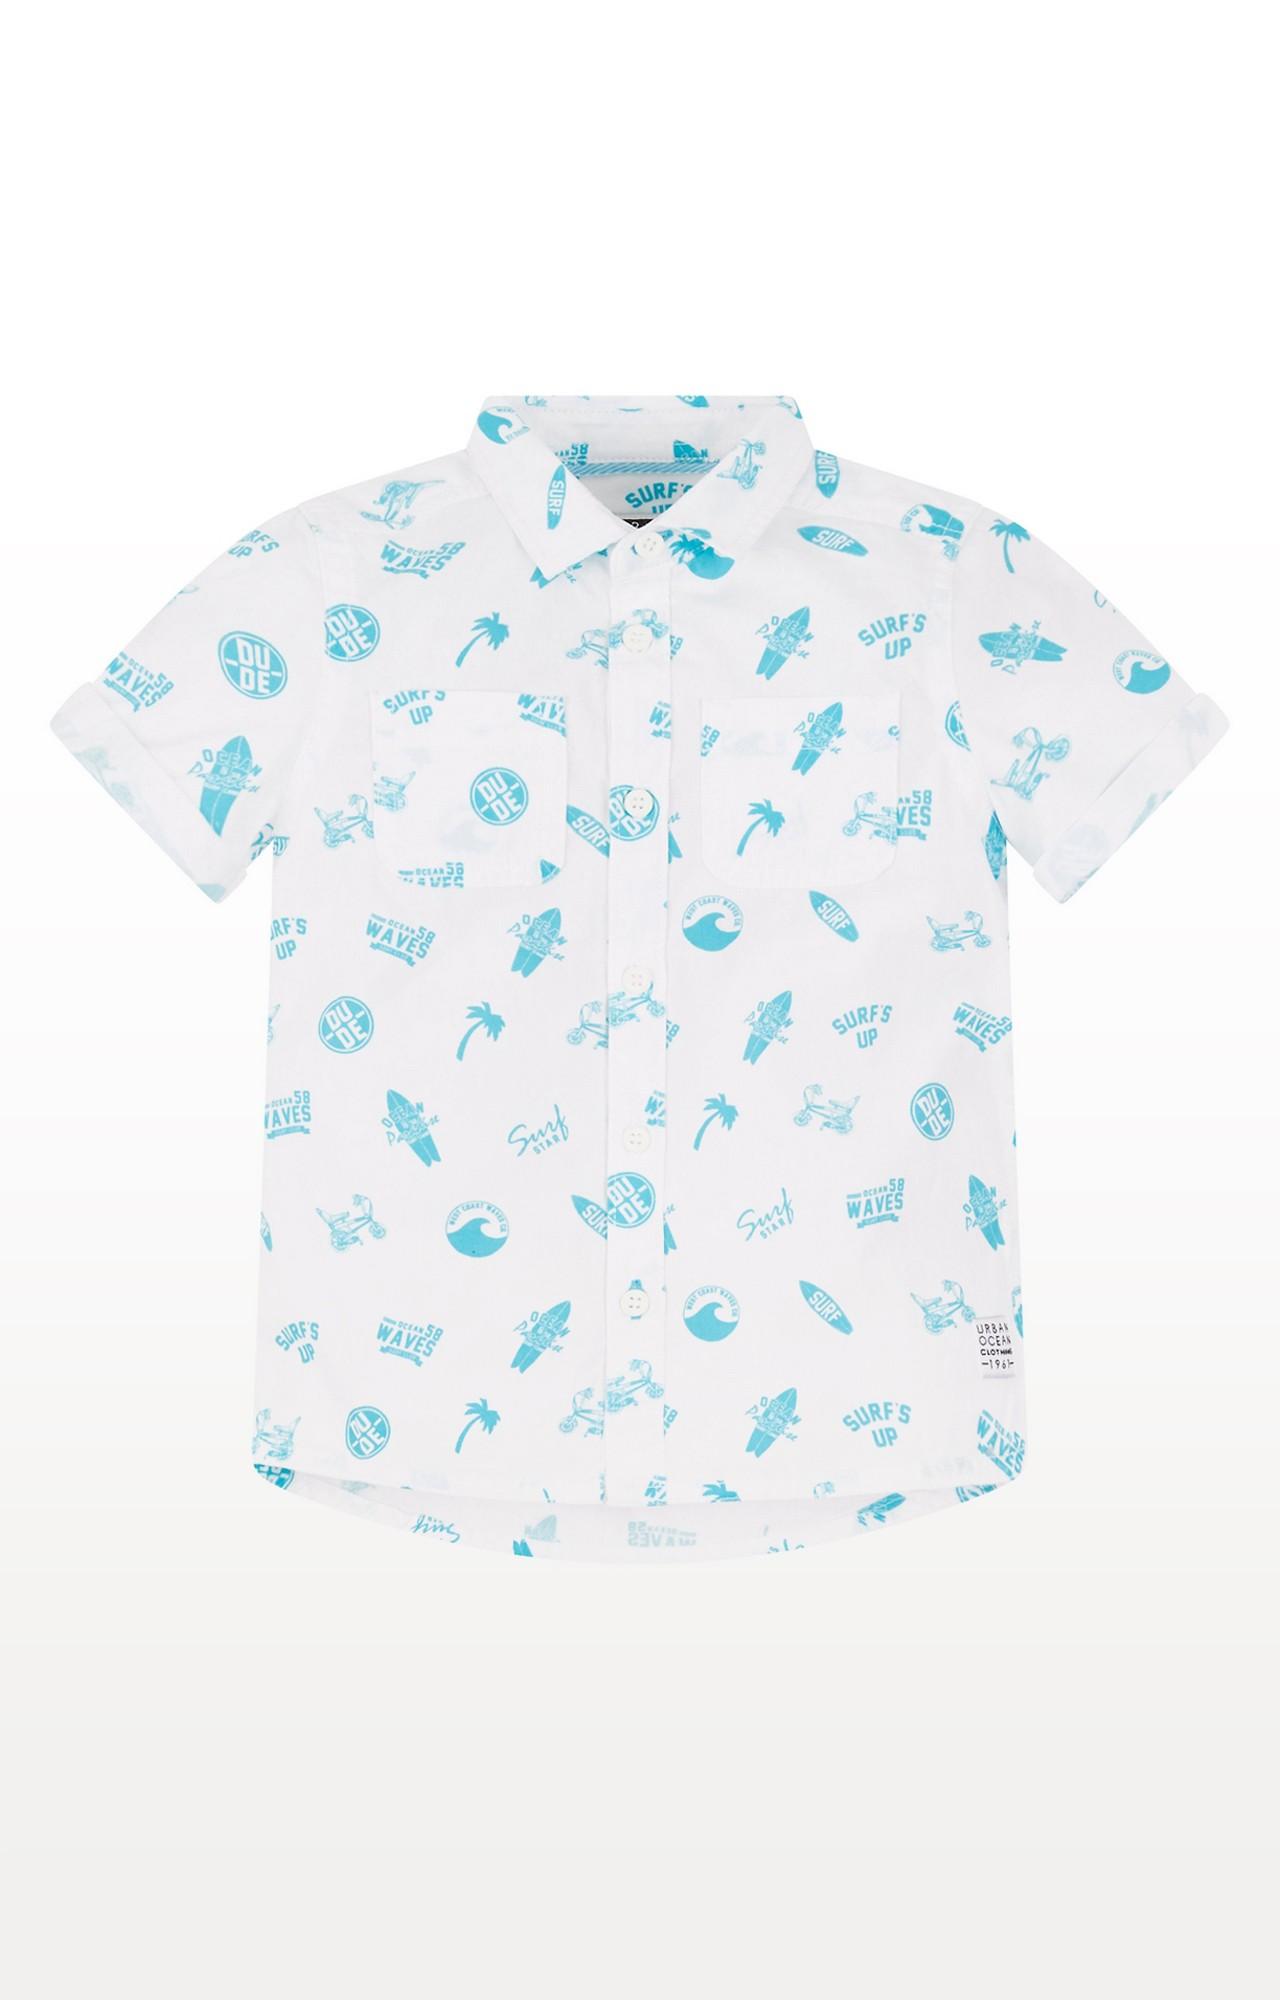 Mothercare   White & Blue Printed Shirt